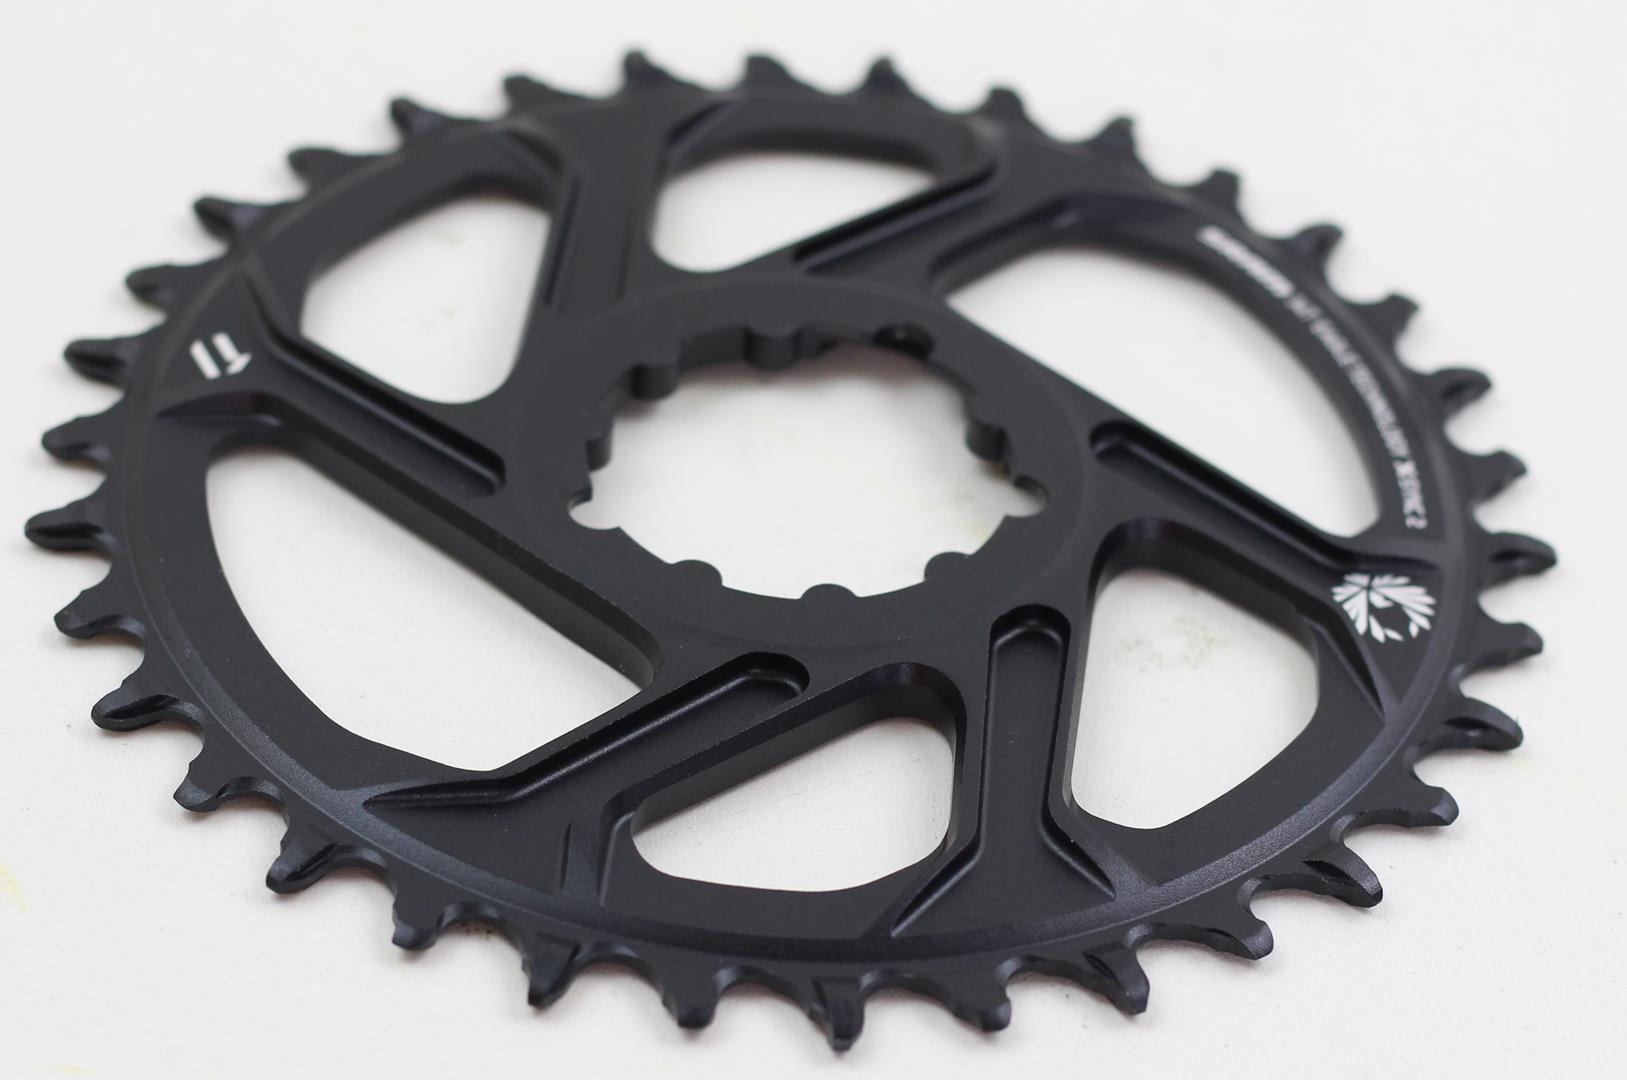 Coroa Unica Bicicleta Sram XX1 Eagle 34 dentes Offset 3mm Boost Para Uso 1x12 GX X01